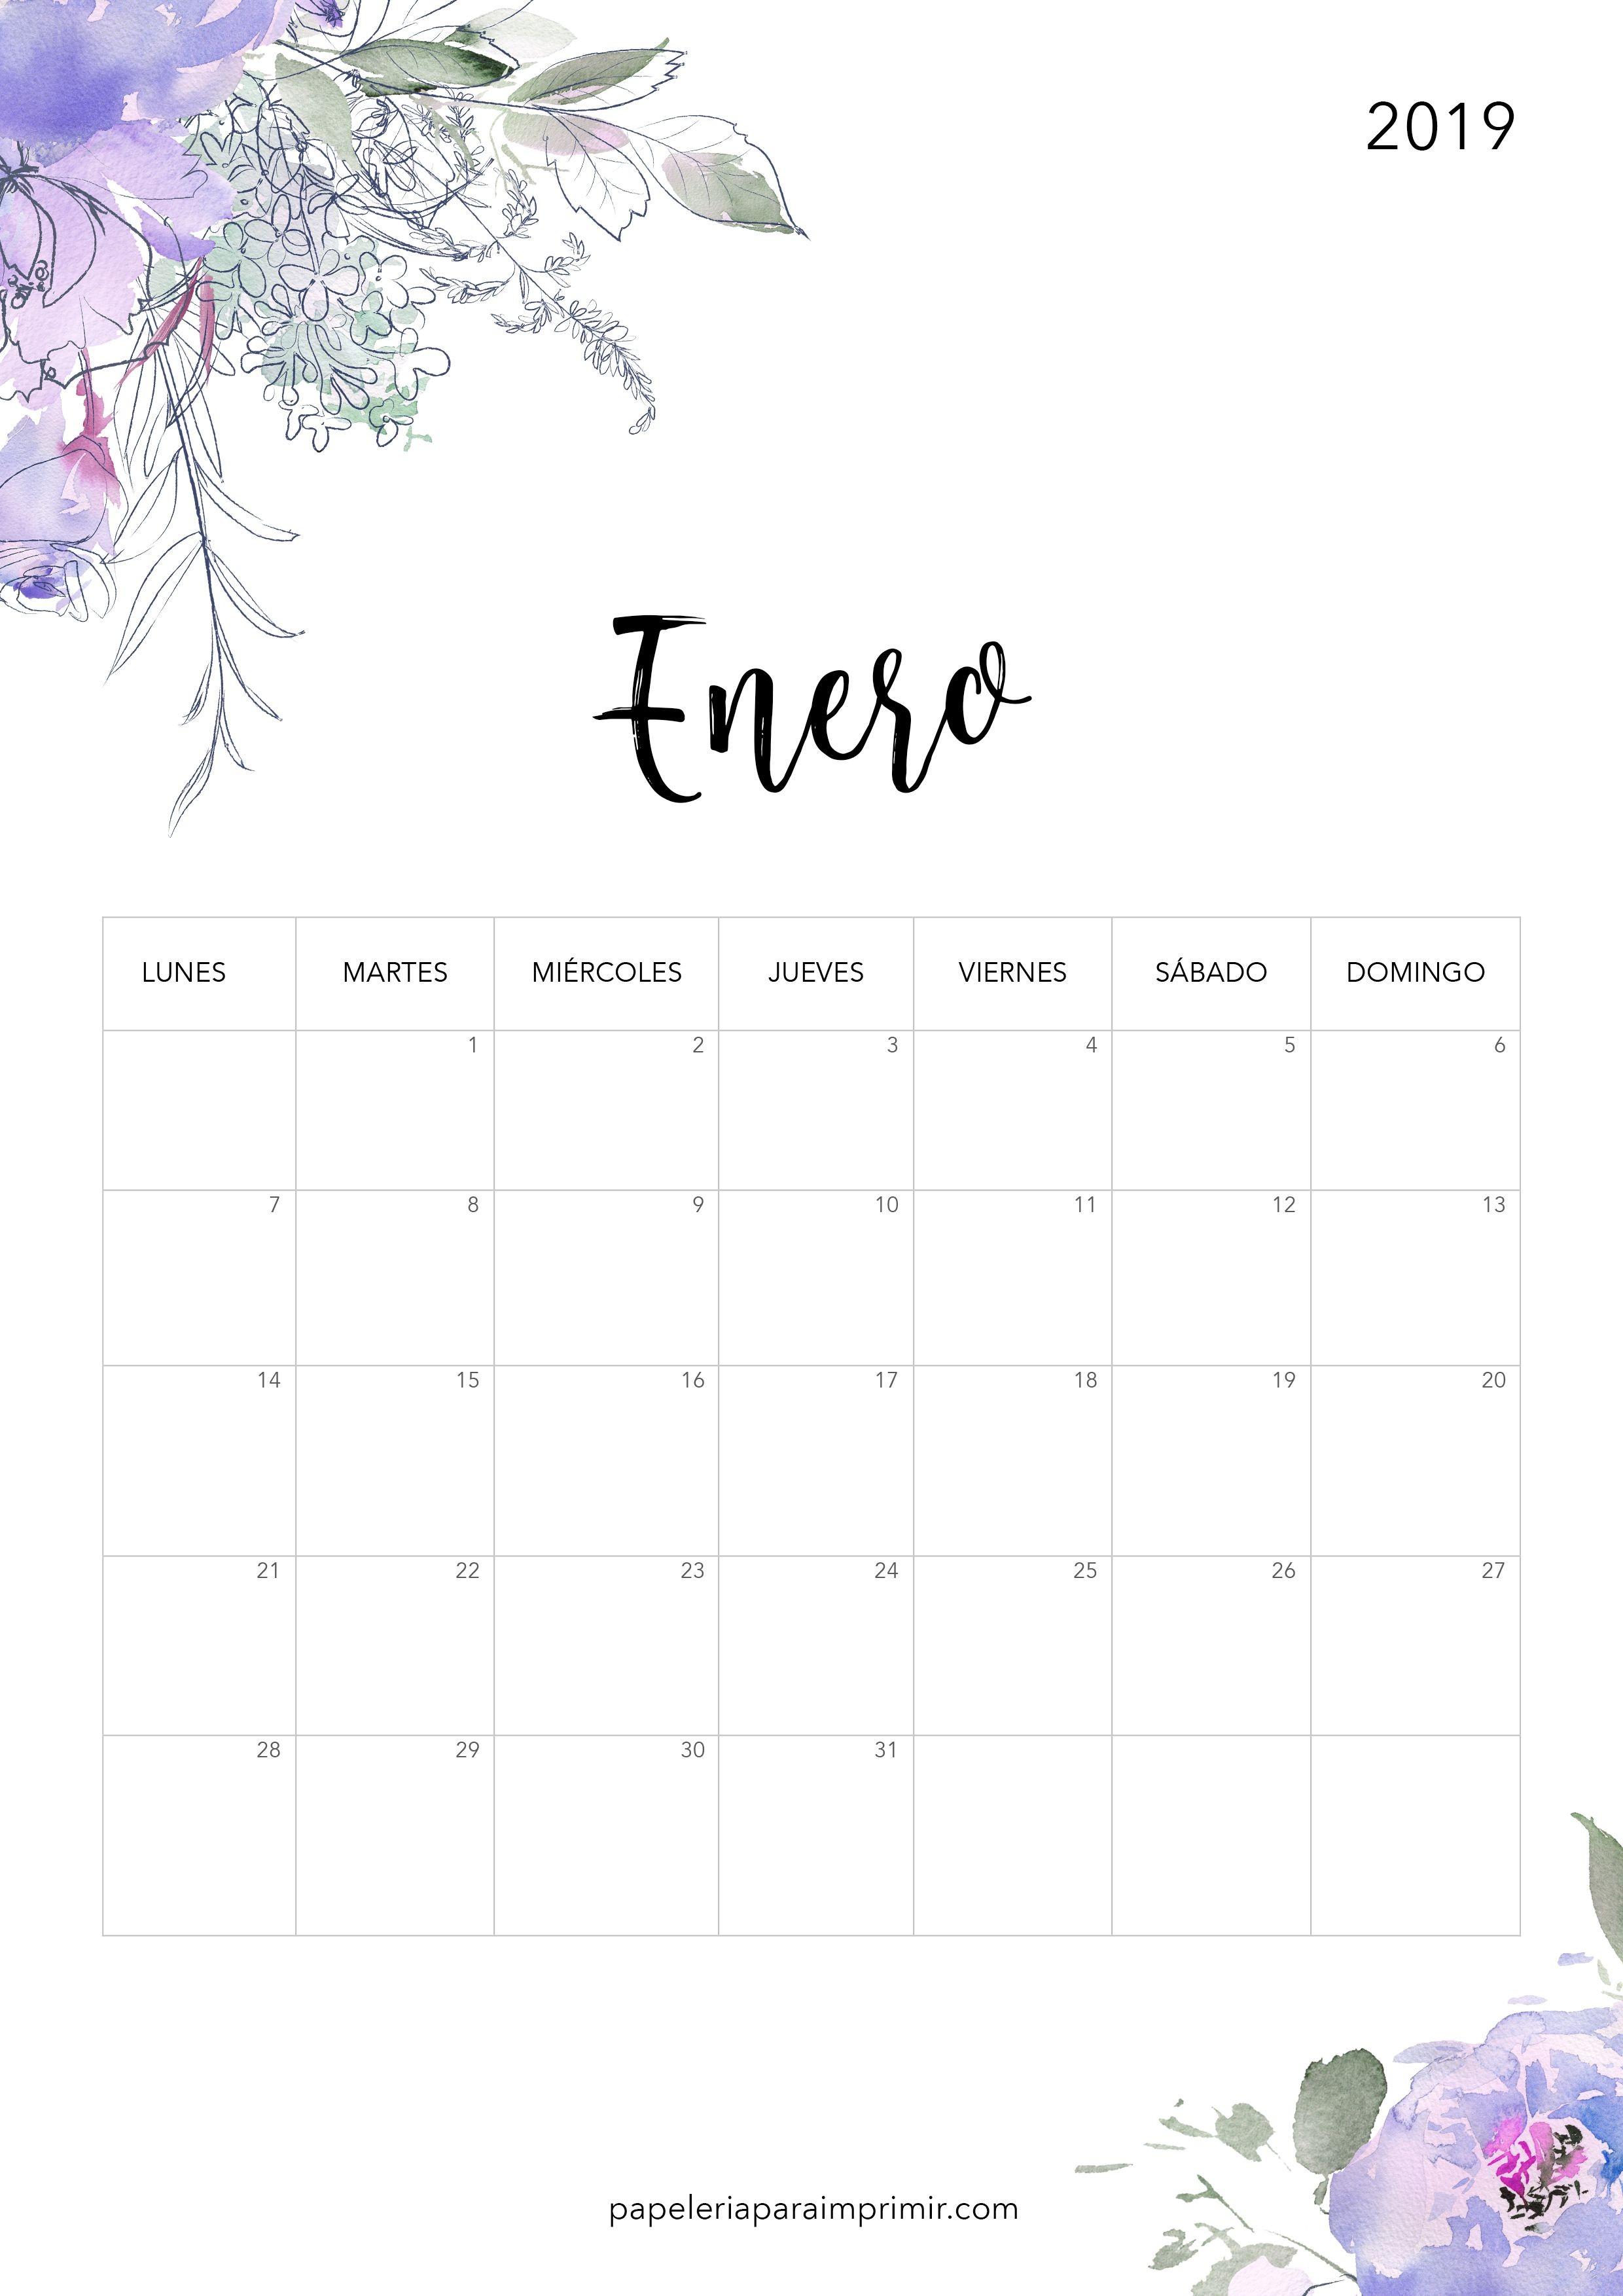 Calendario para imprimir 2019 Enero calendario imprimir enero gratis freebie printable january flowers flores alamanaque bonito